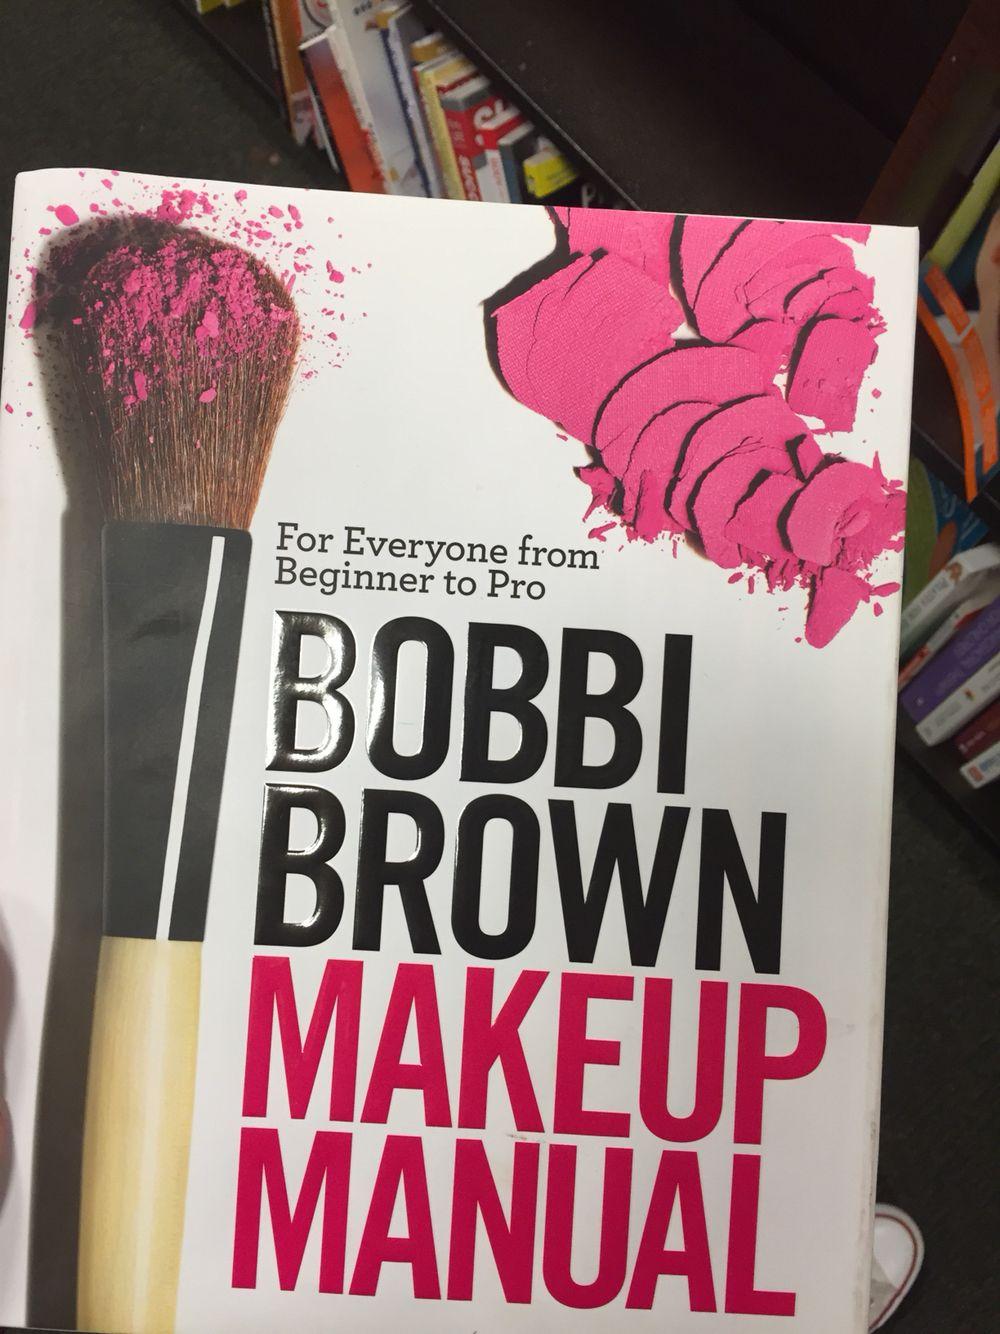 Thats a secret I will never tell Bobbi brown makeup